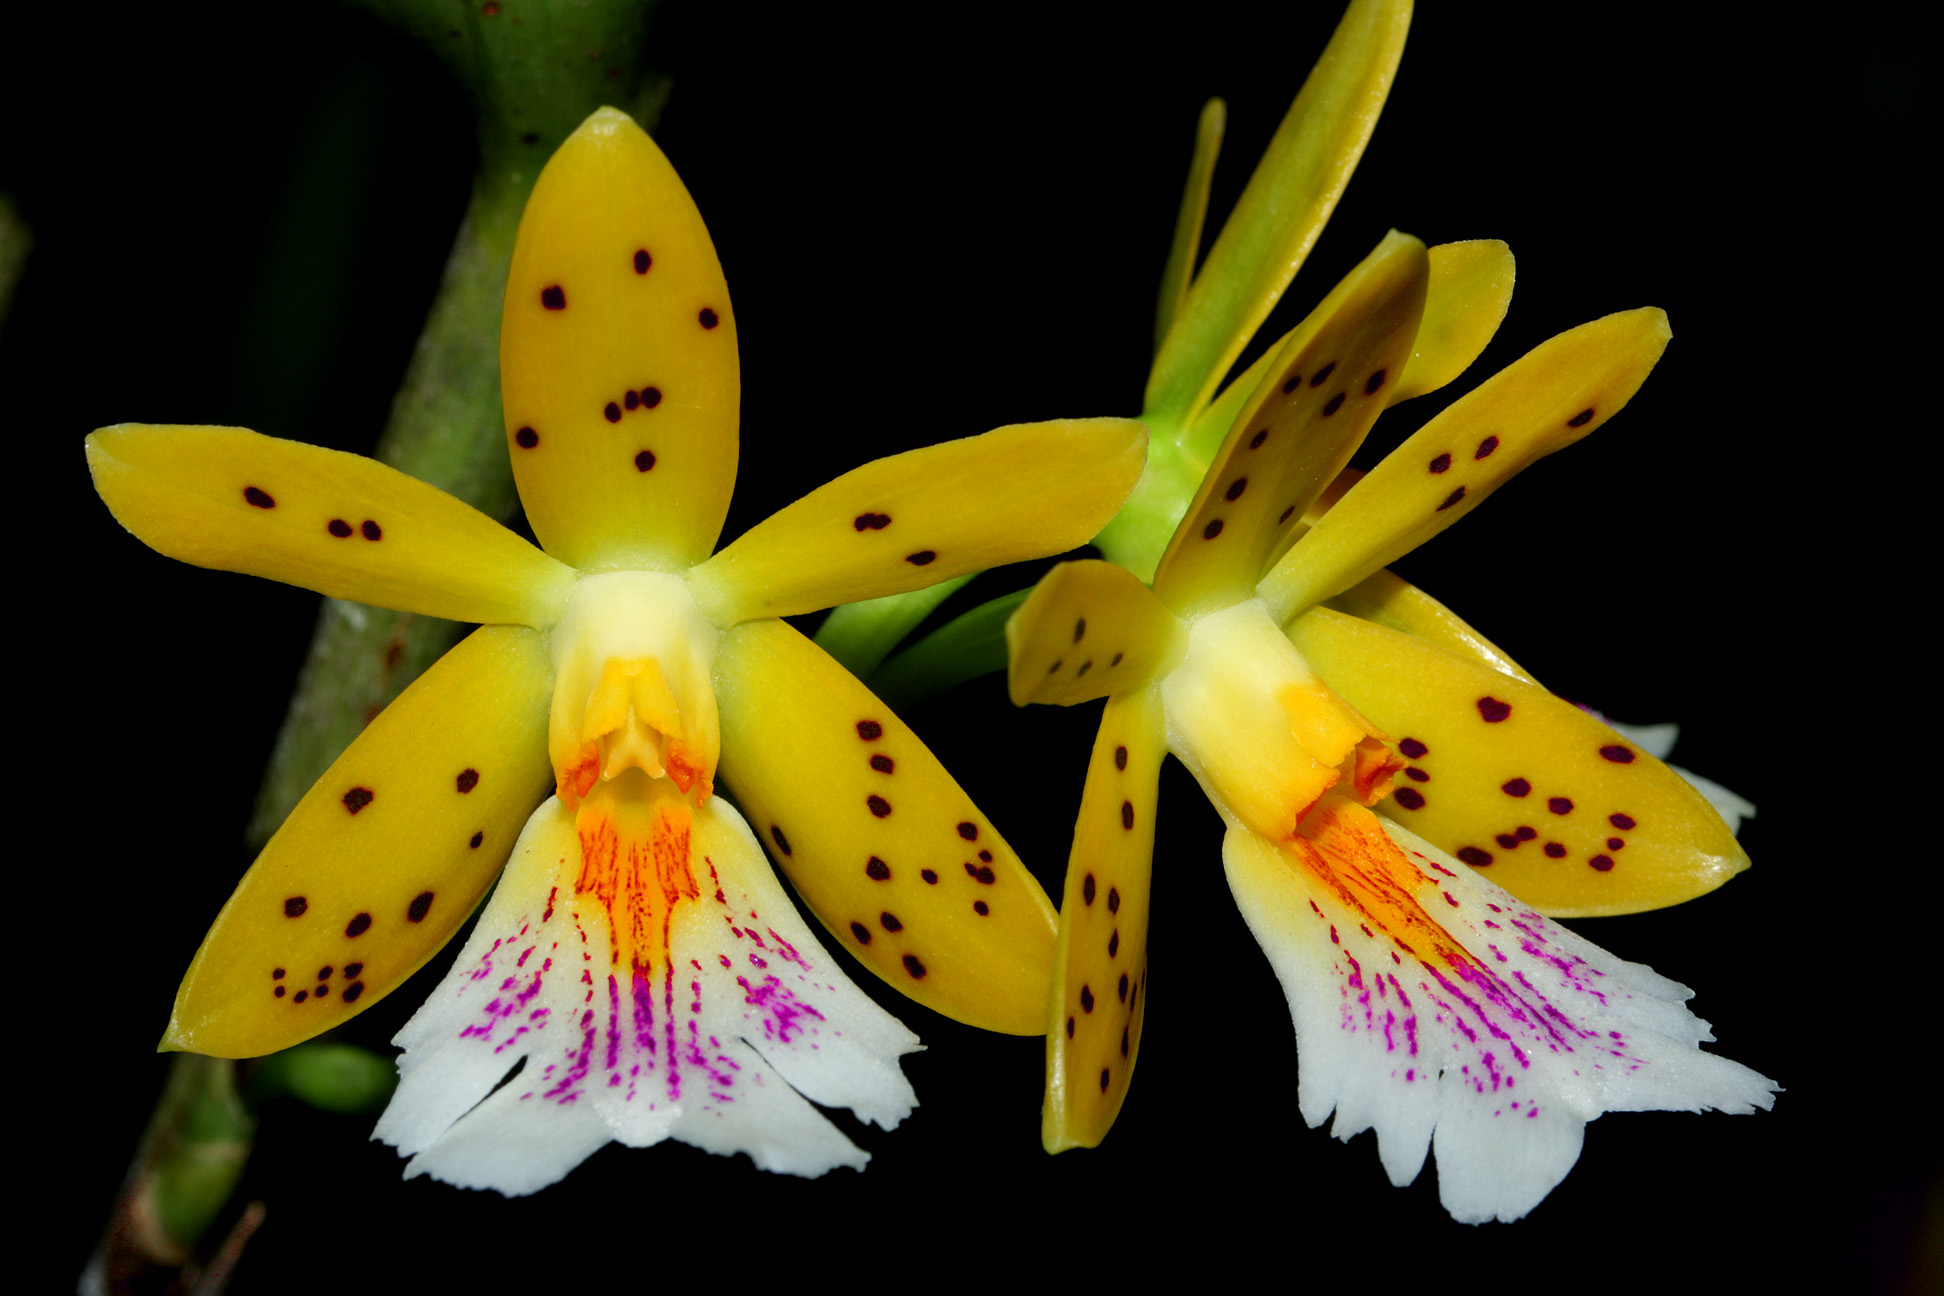 https://www.orchideenausstellung-wien.at/wp-content/uploads/2017/03/Oerstedella_IMG_9160100m2s.jpg